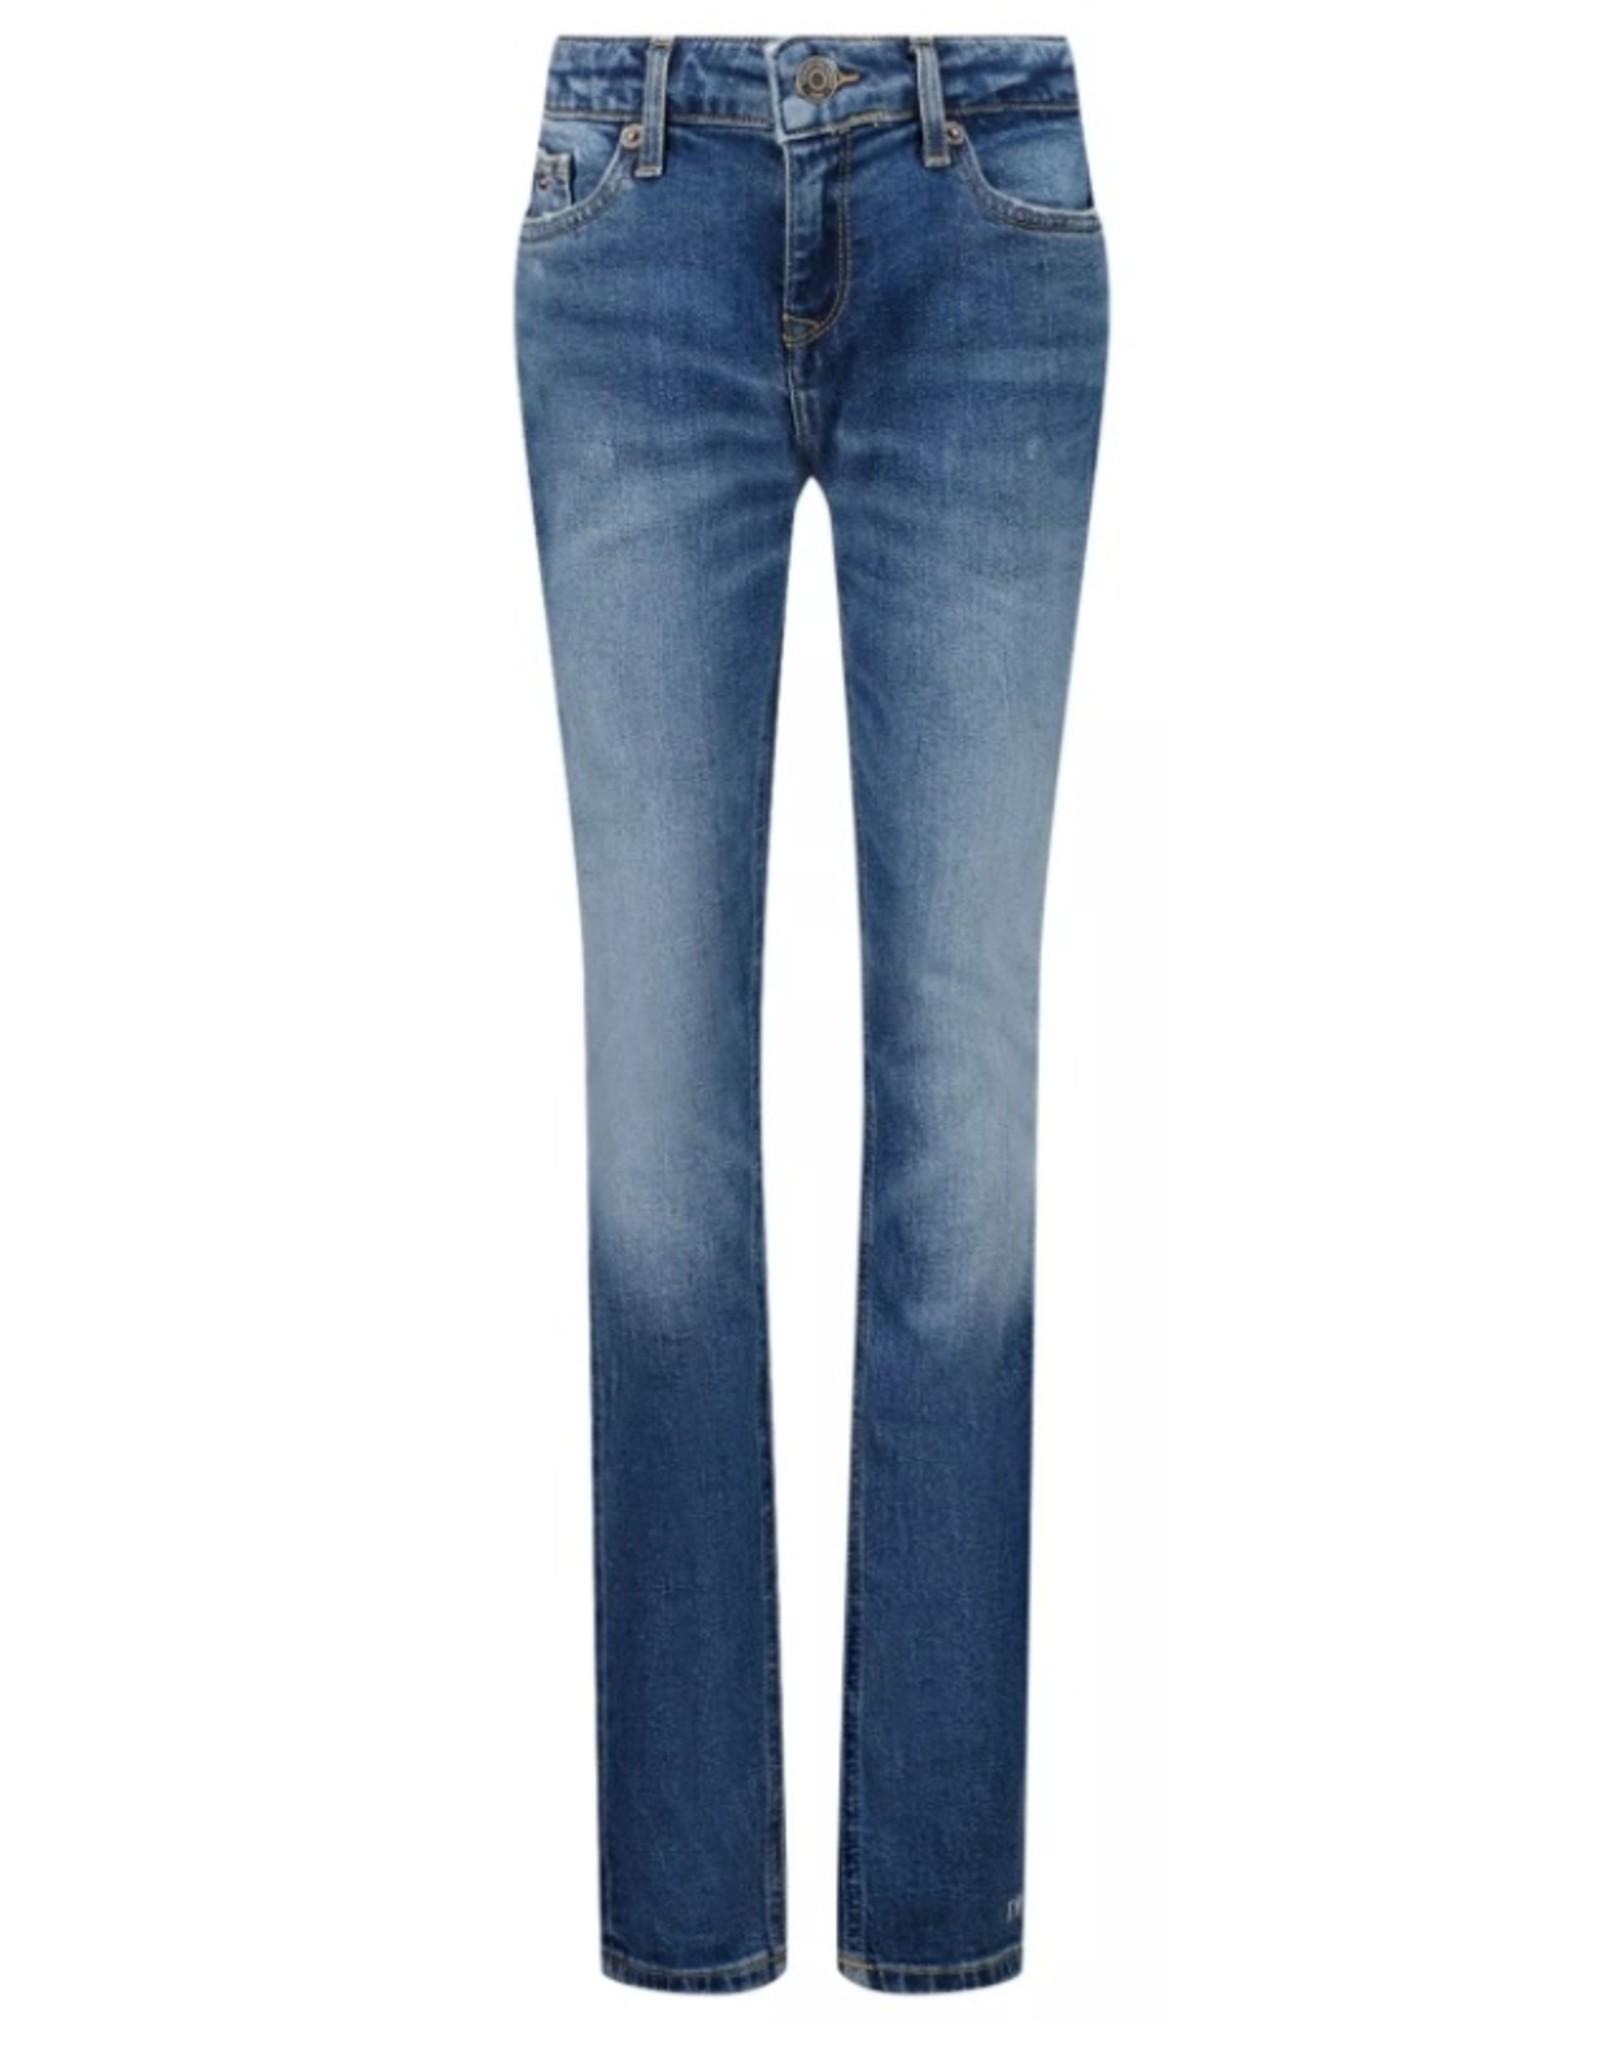 Tommy Hilfiger 5959 Jeans